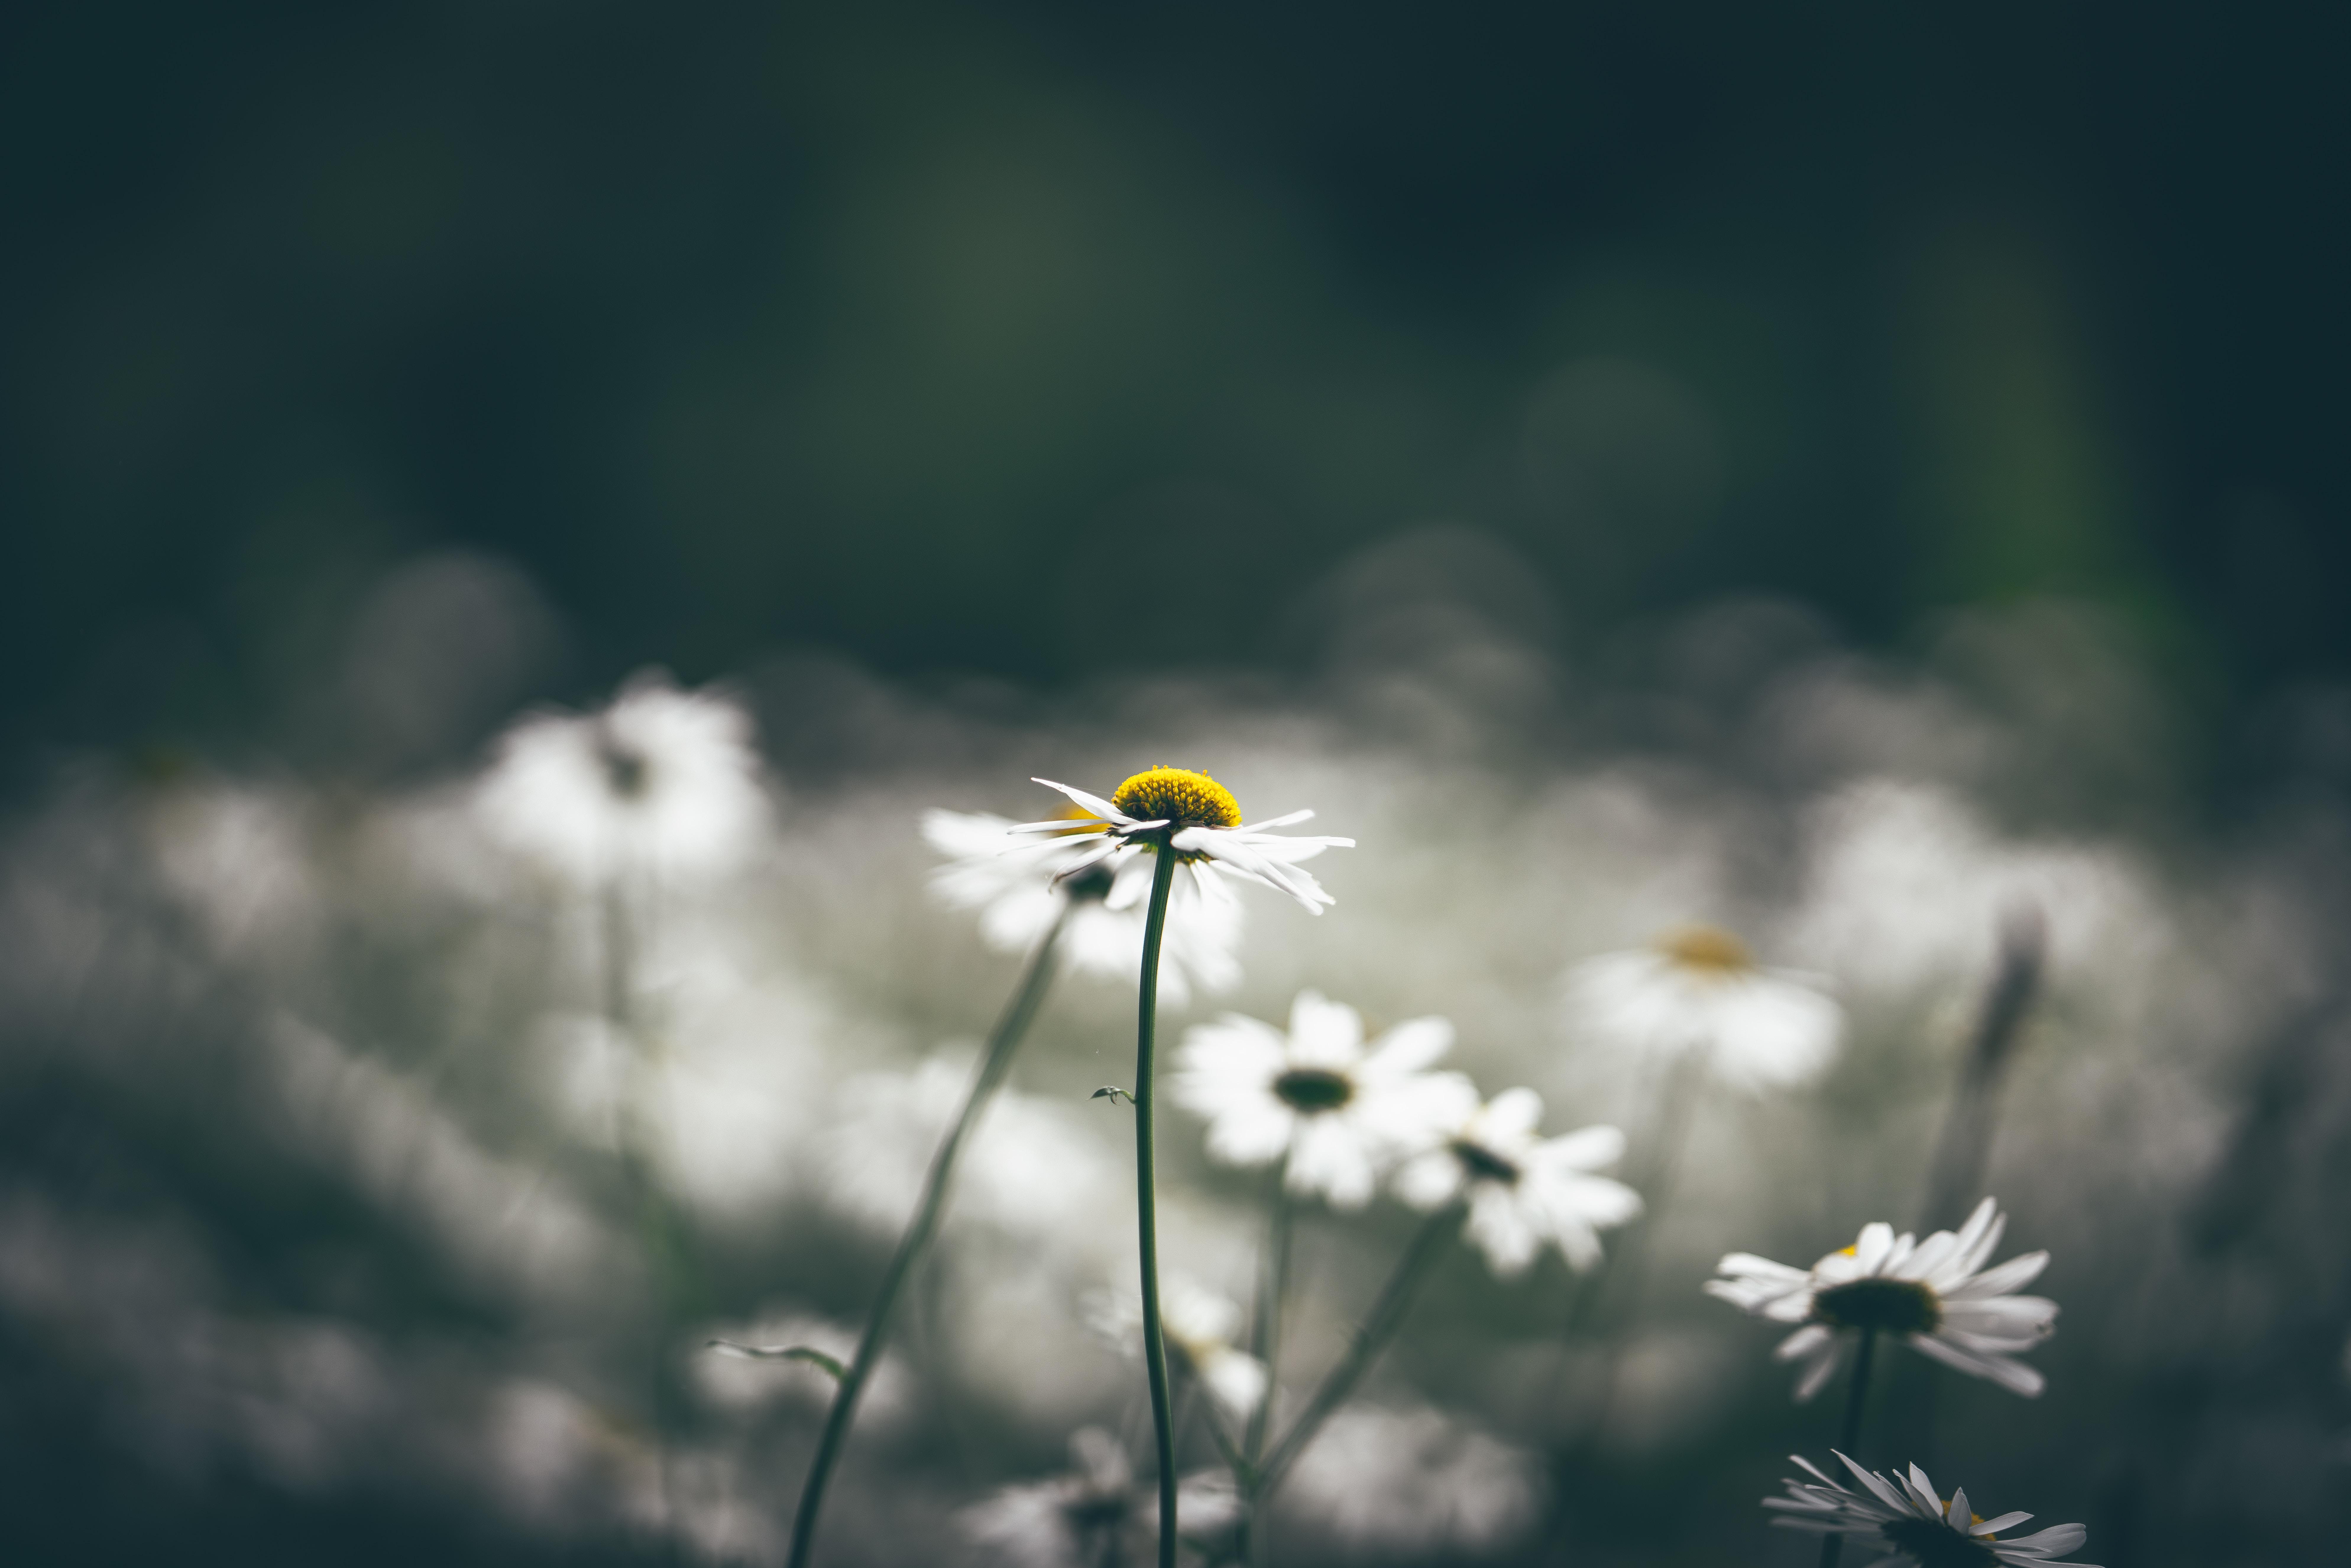 selective focus photo of white daisy